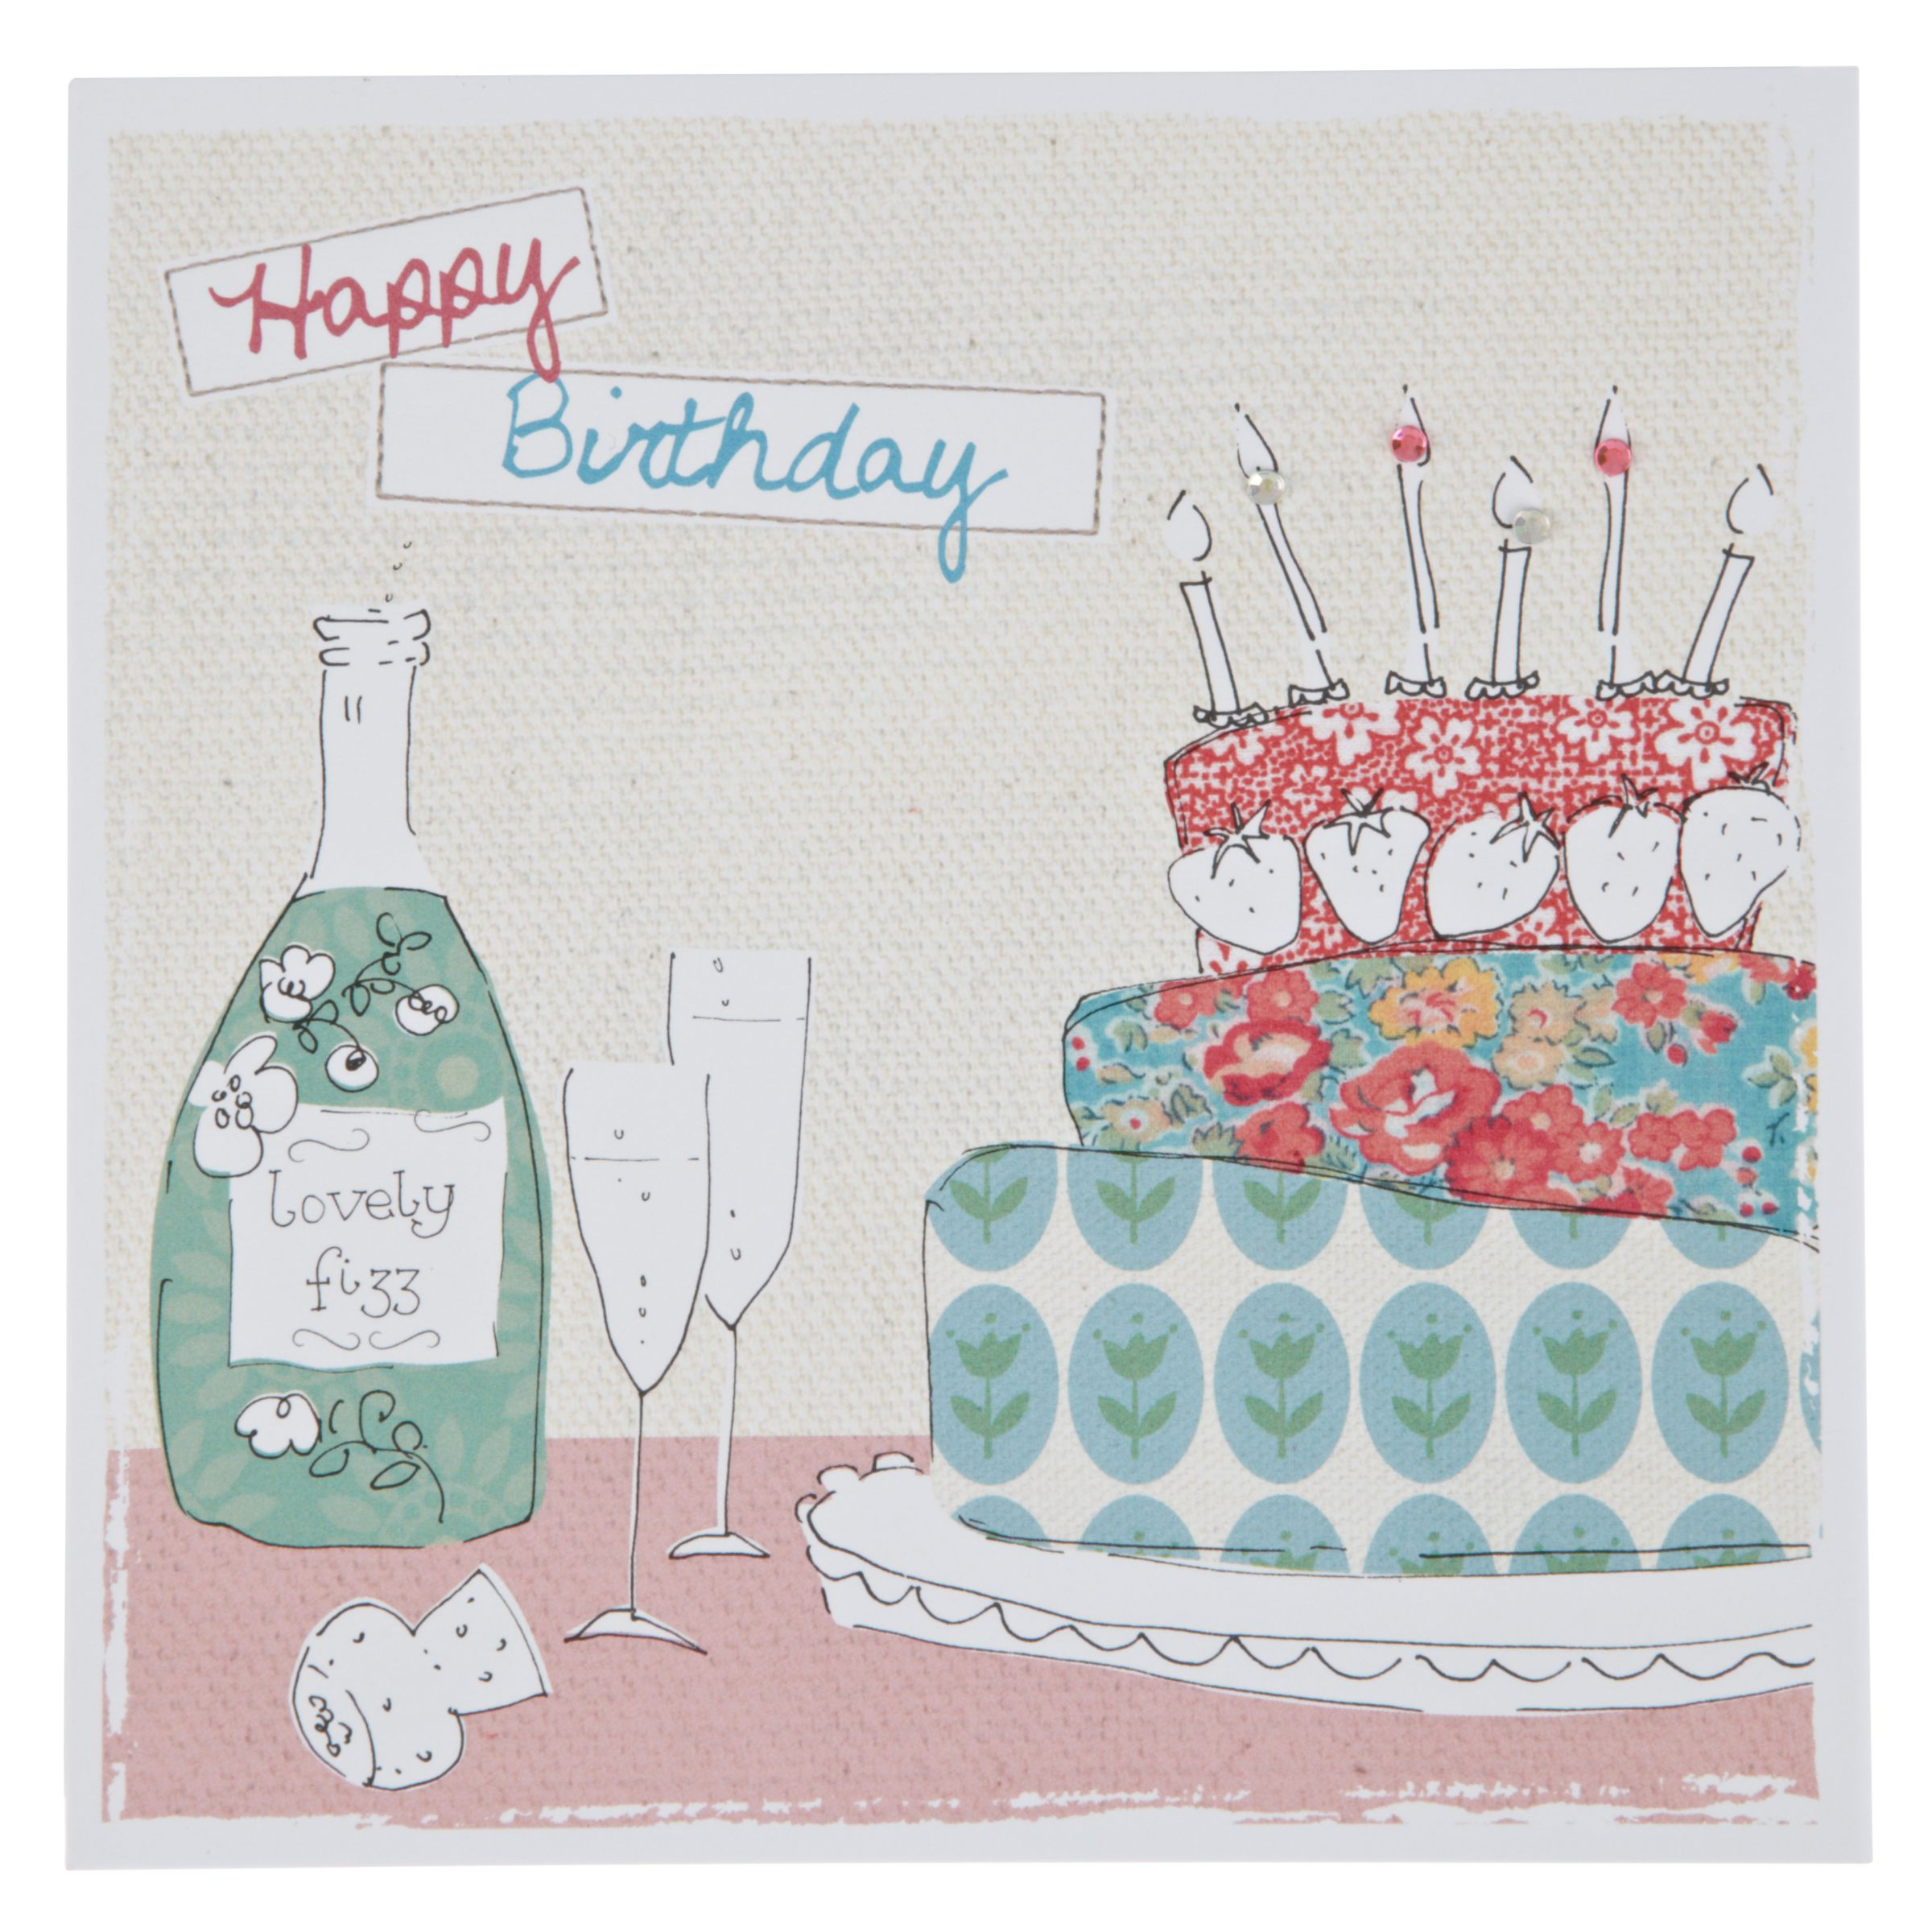 Birthday Cake John Lewis : Buy Saffron World Wide Cake & Champagne Birthday Card ...